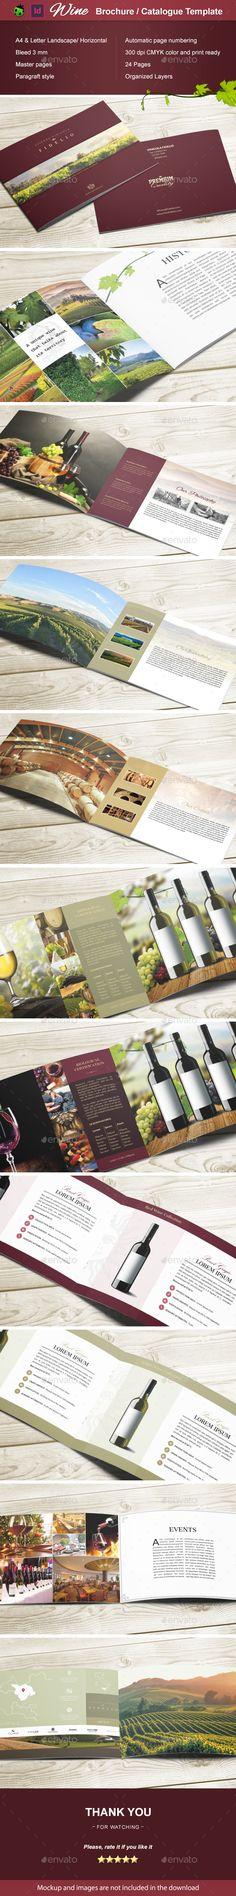 Wine Brochure / Catalogue — InDesign INDD #winemaker #catalogue • Download ➝ https://graphicriver.net/item/wine-brochure-catalogue/18772457?ref=pxcr